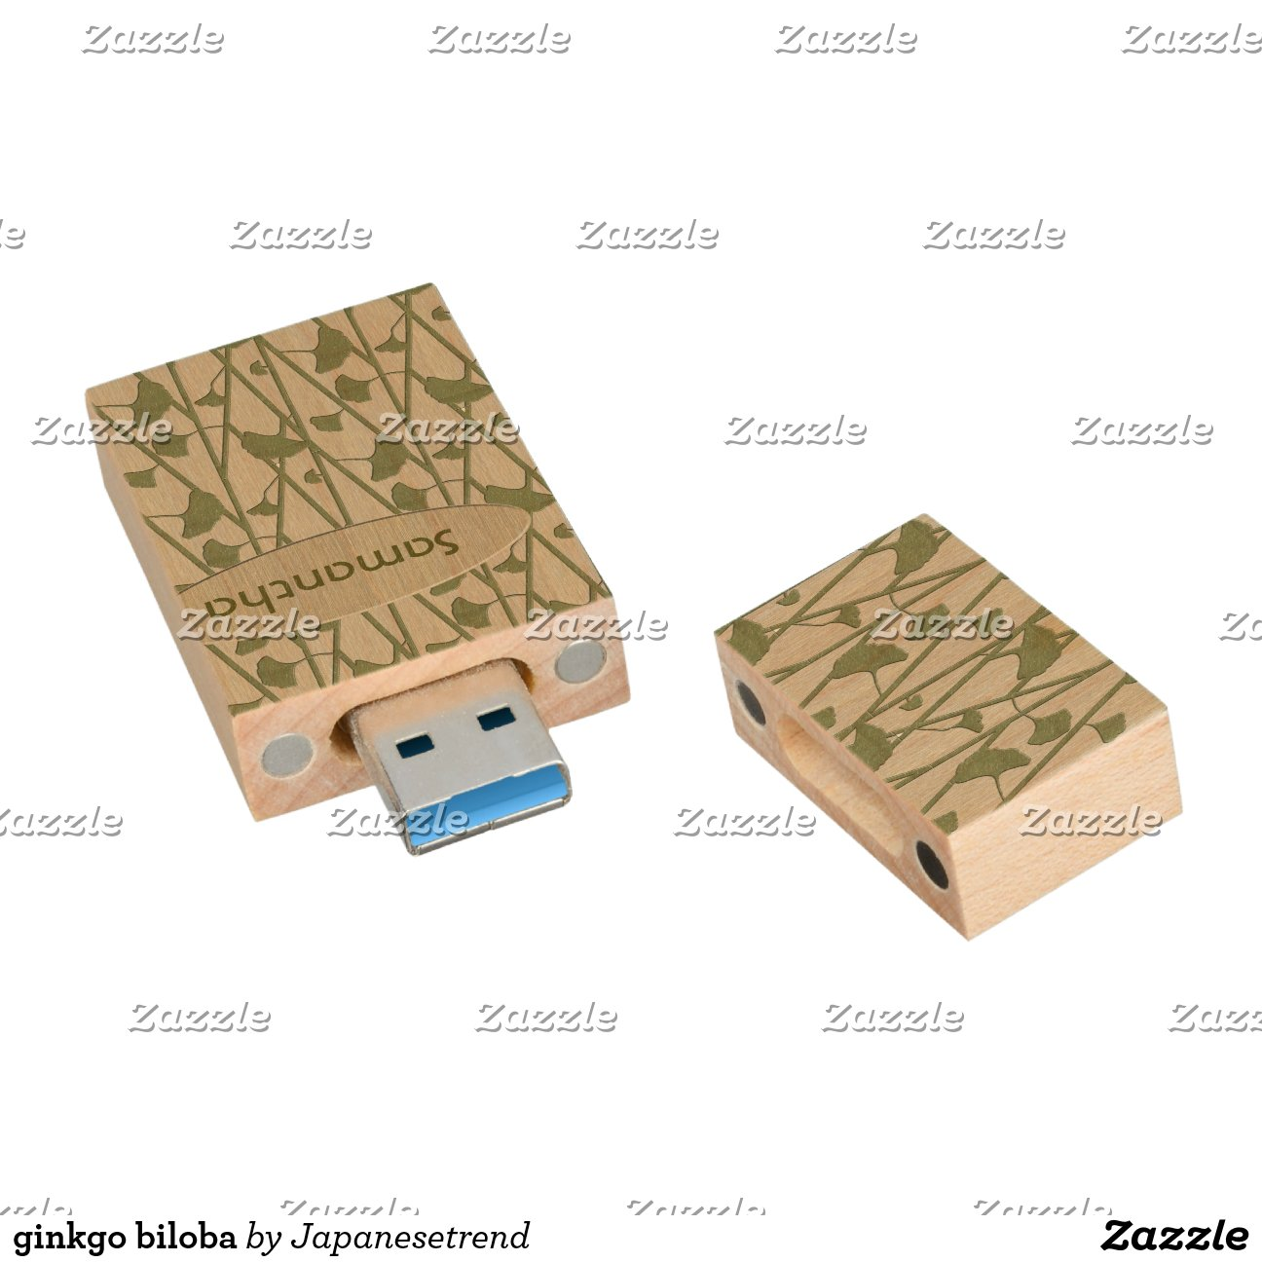 ginkgo biloba cl usb 3 0 en bois zazzle. Black Bedroom Furniture Sets. Home Design Ideas